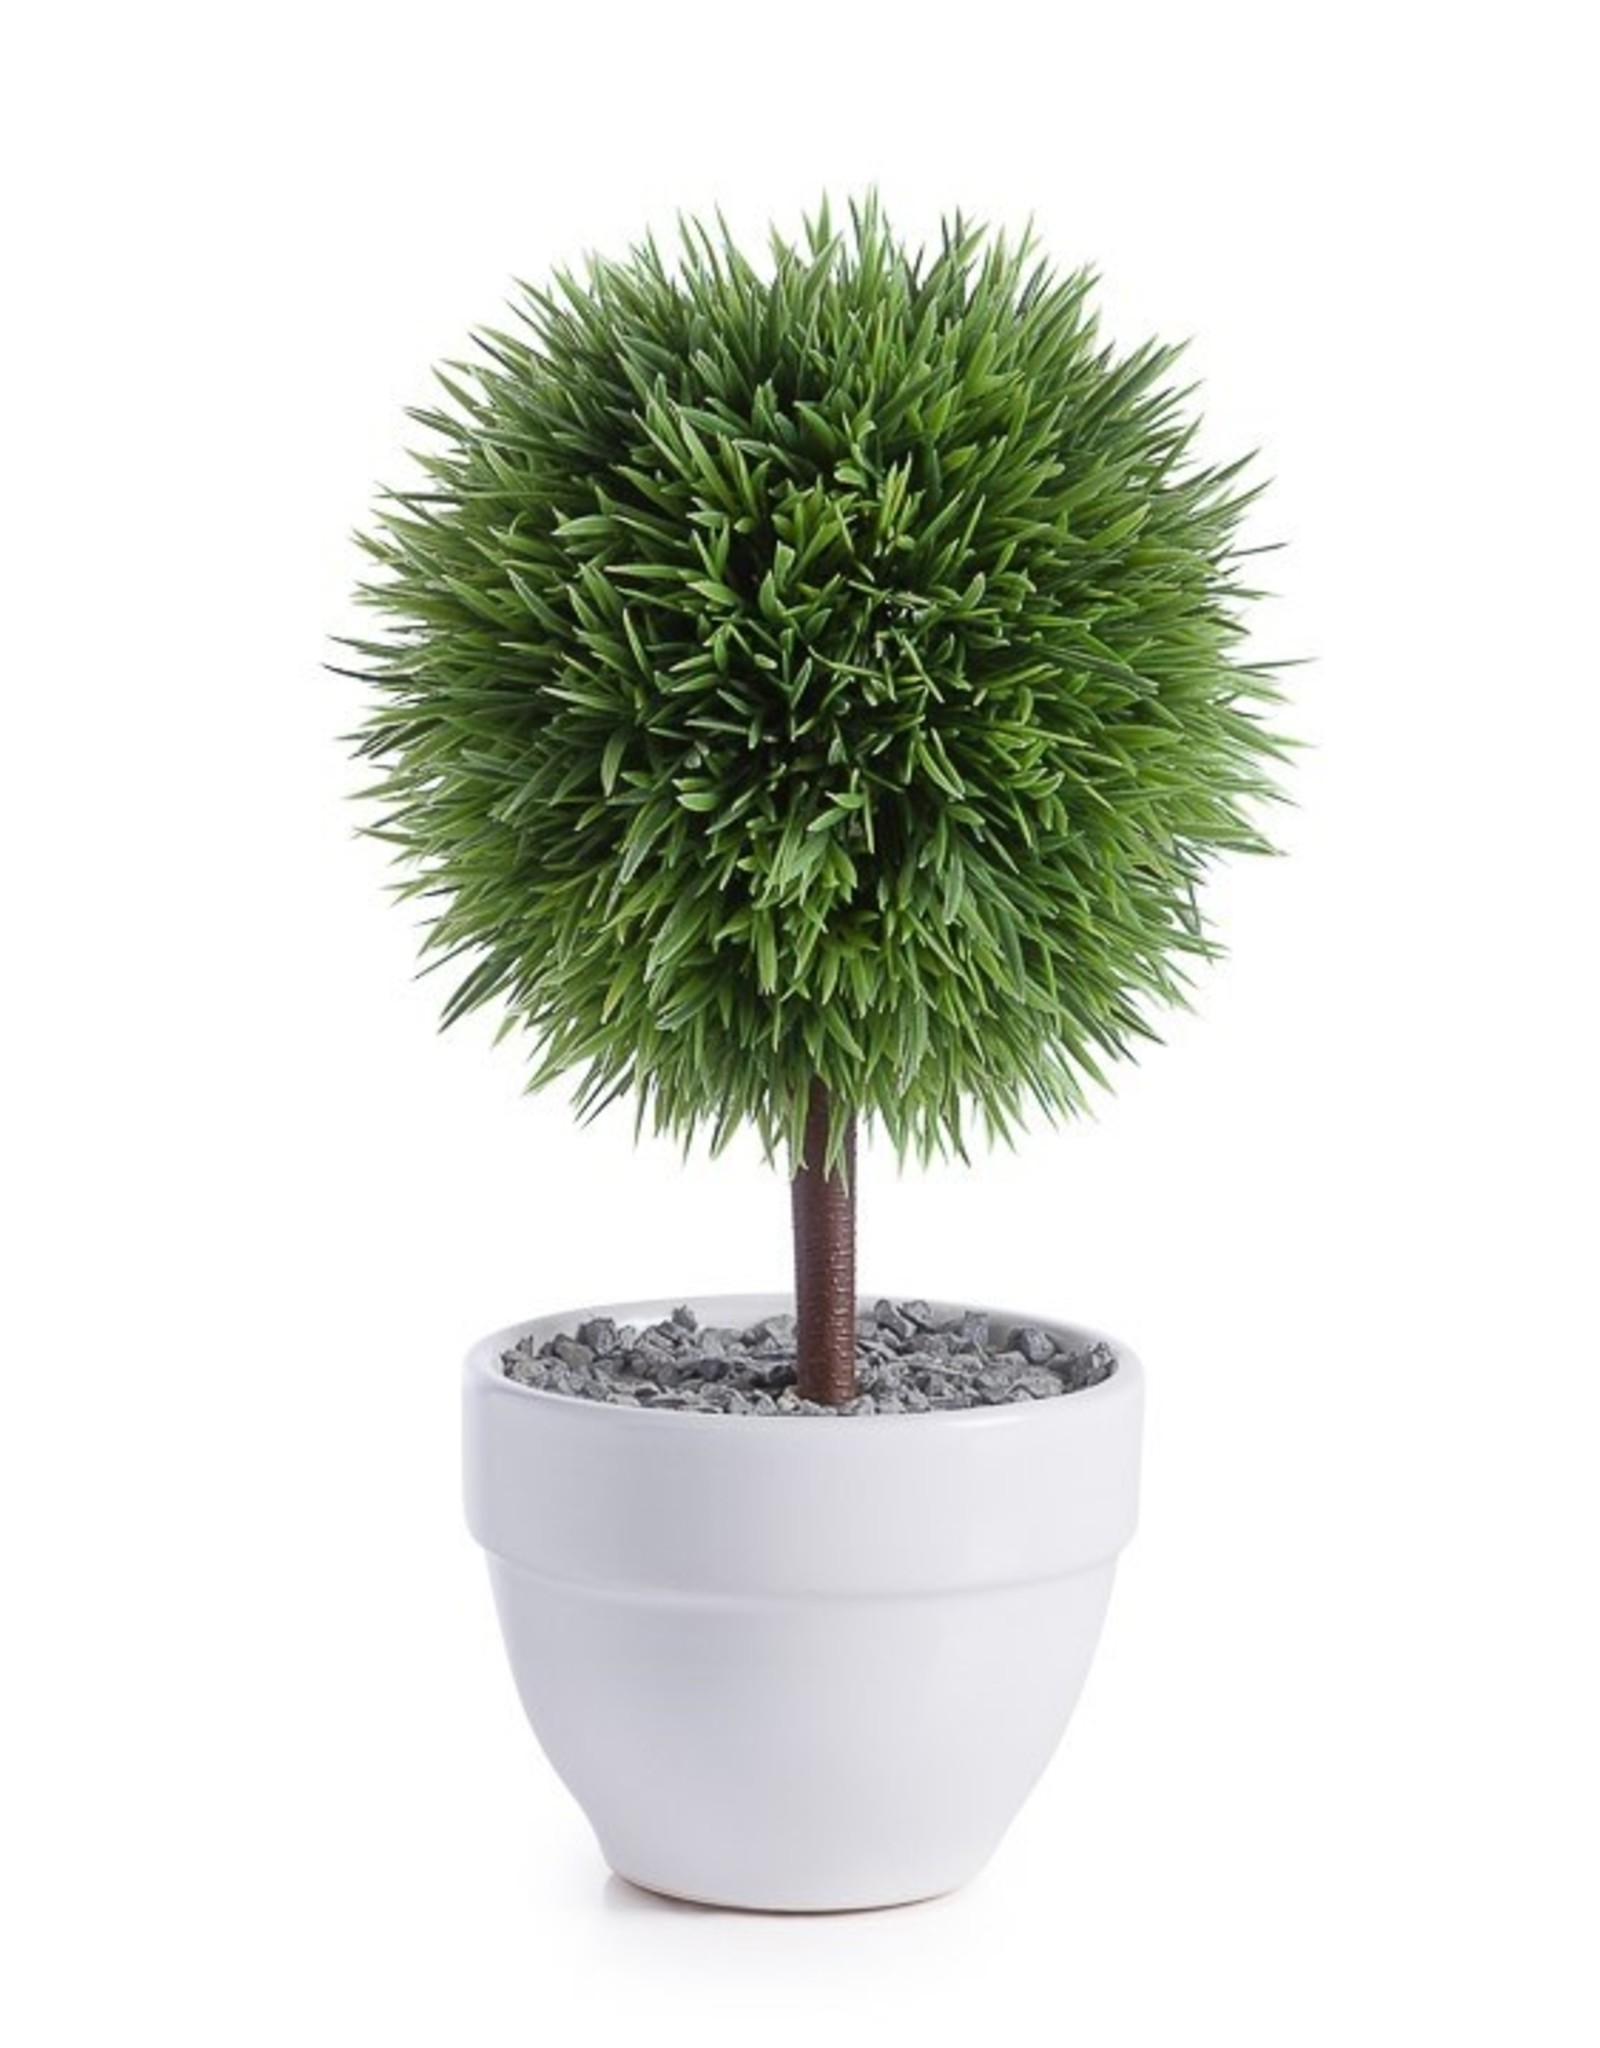 Plant Torre & Tagus Jardin Grass Ball